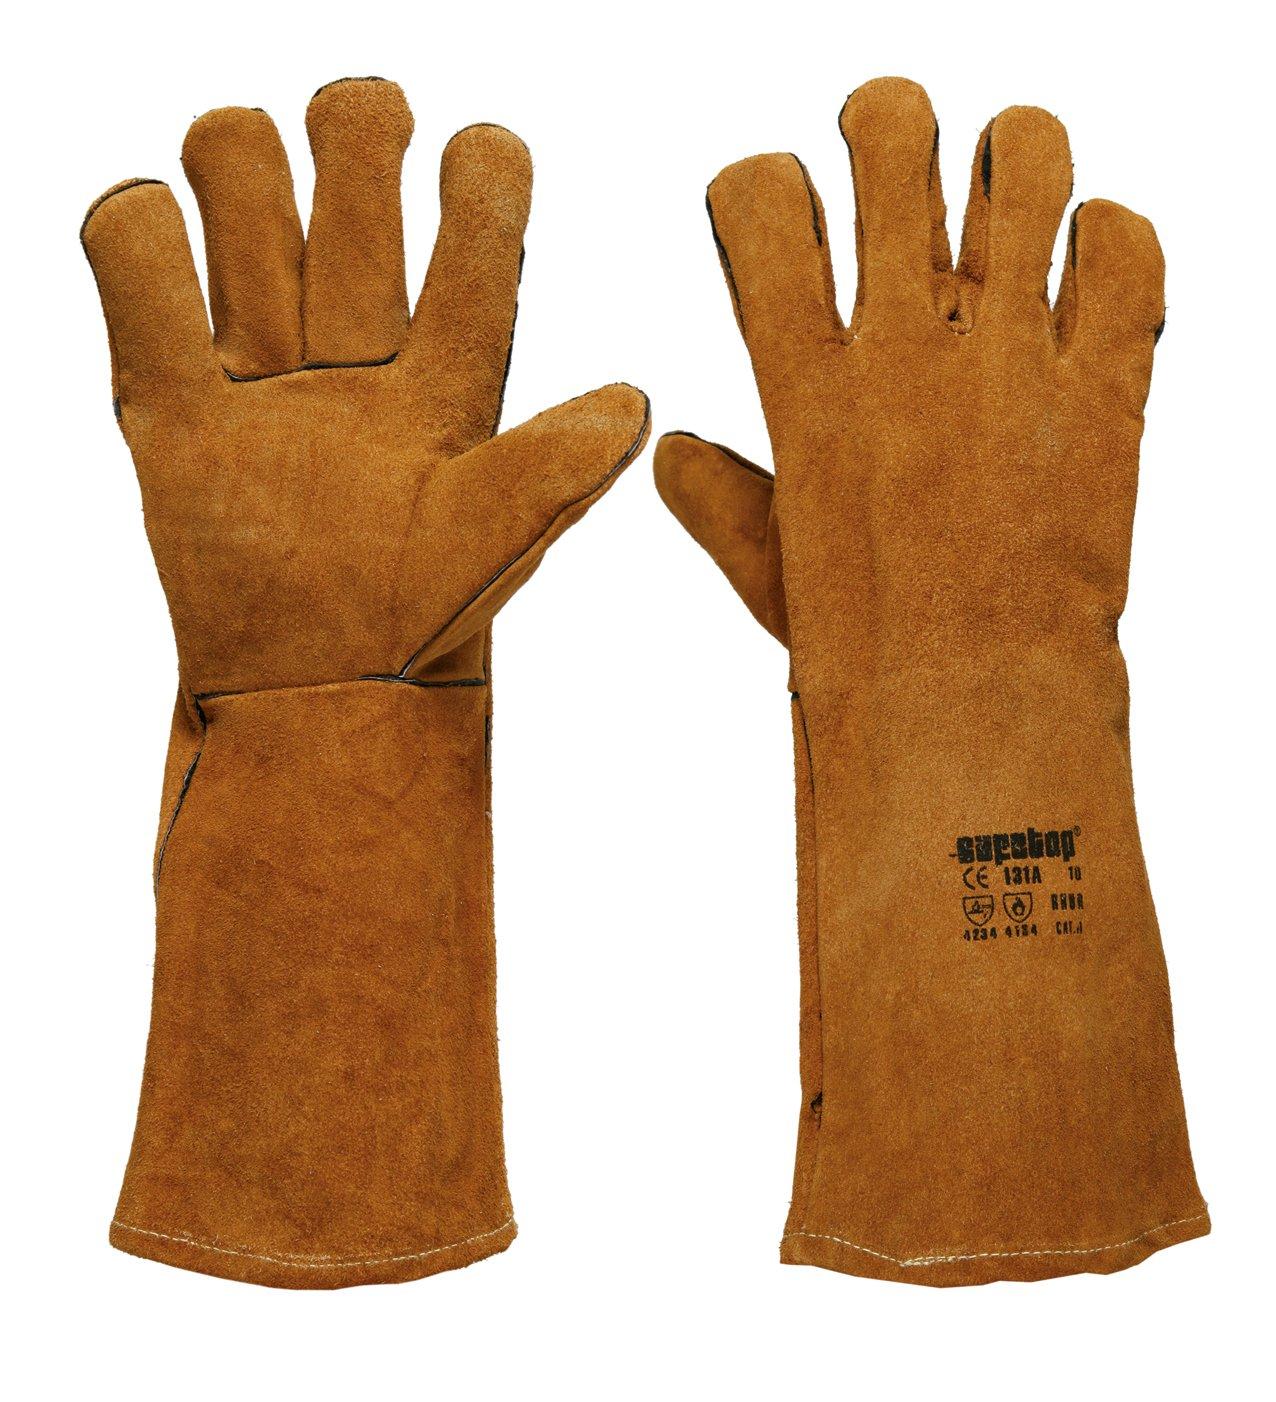 SAFETOP Schweißer-Handschuhe Modell Rhur Größe 10(12-er Pack)